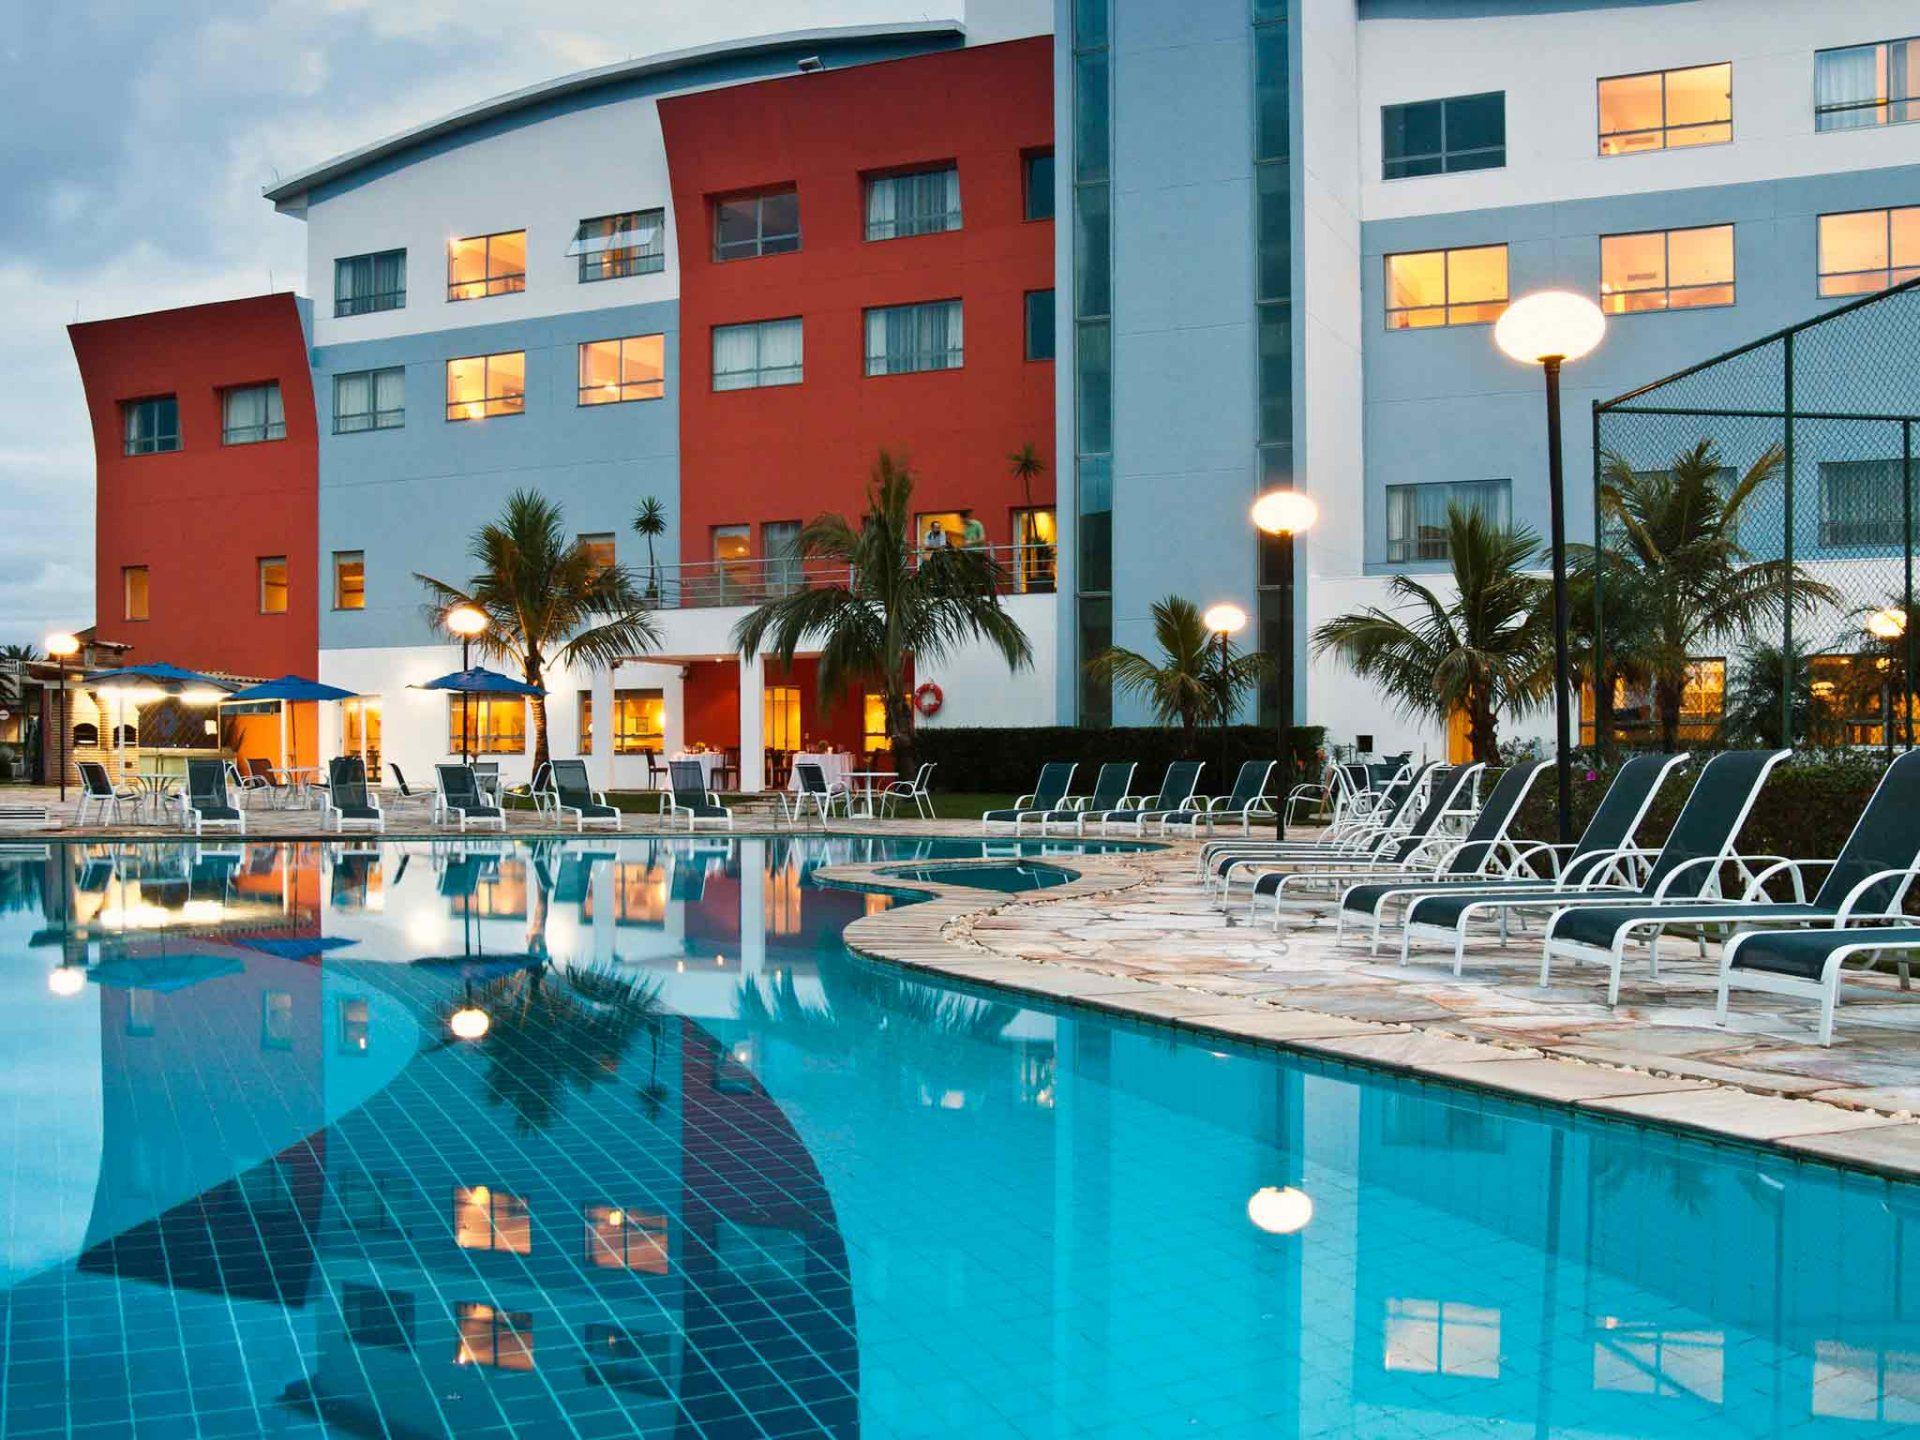 Vista do eSuites Lagoa dos Ingleses a partir da piscina do hotel